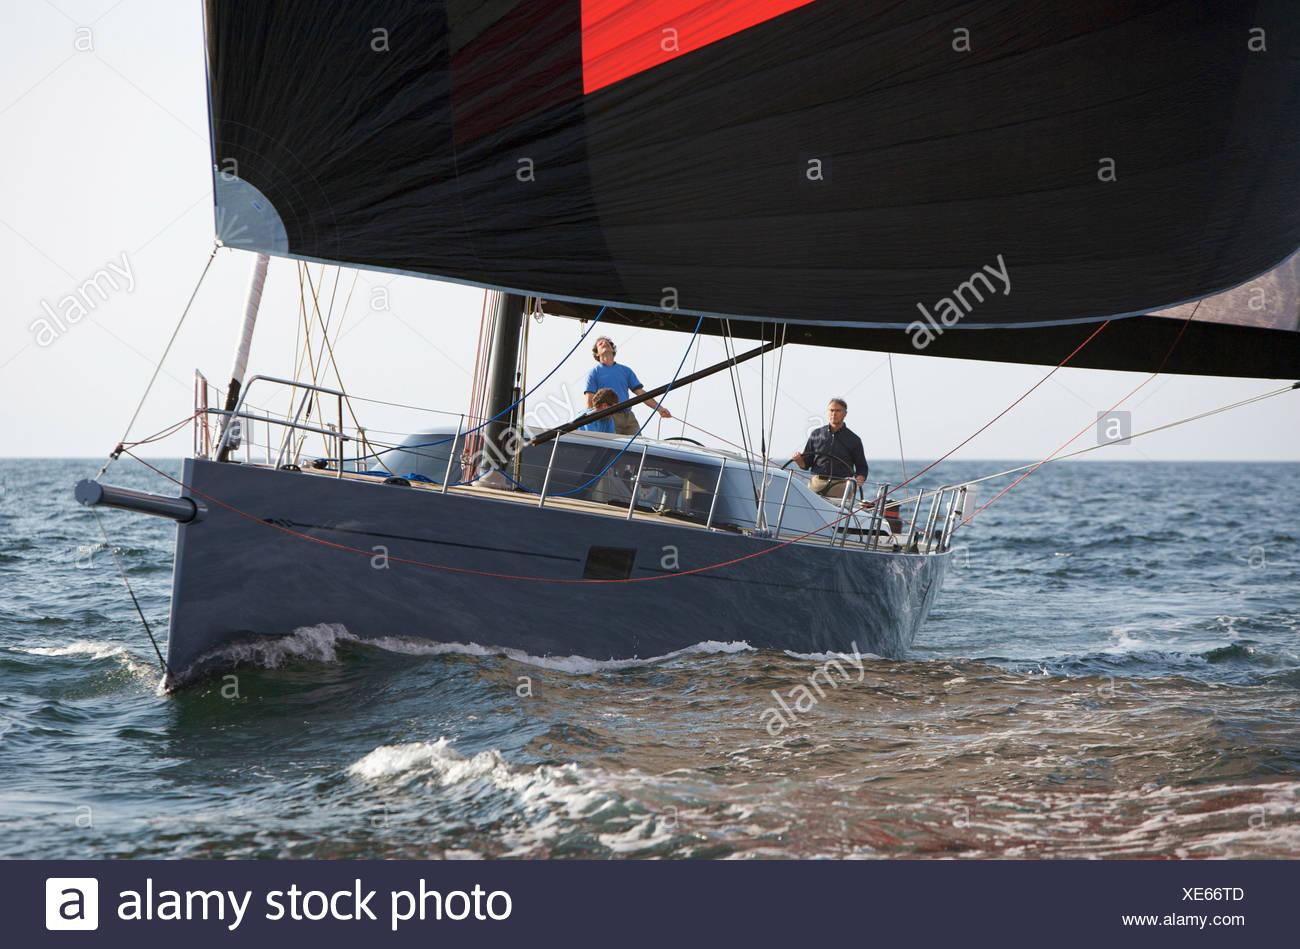 A crew races a modern ocean-going sailing yacht under spinnaker. - Stock Image